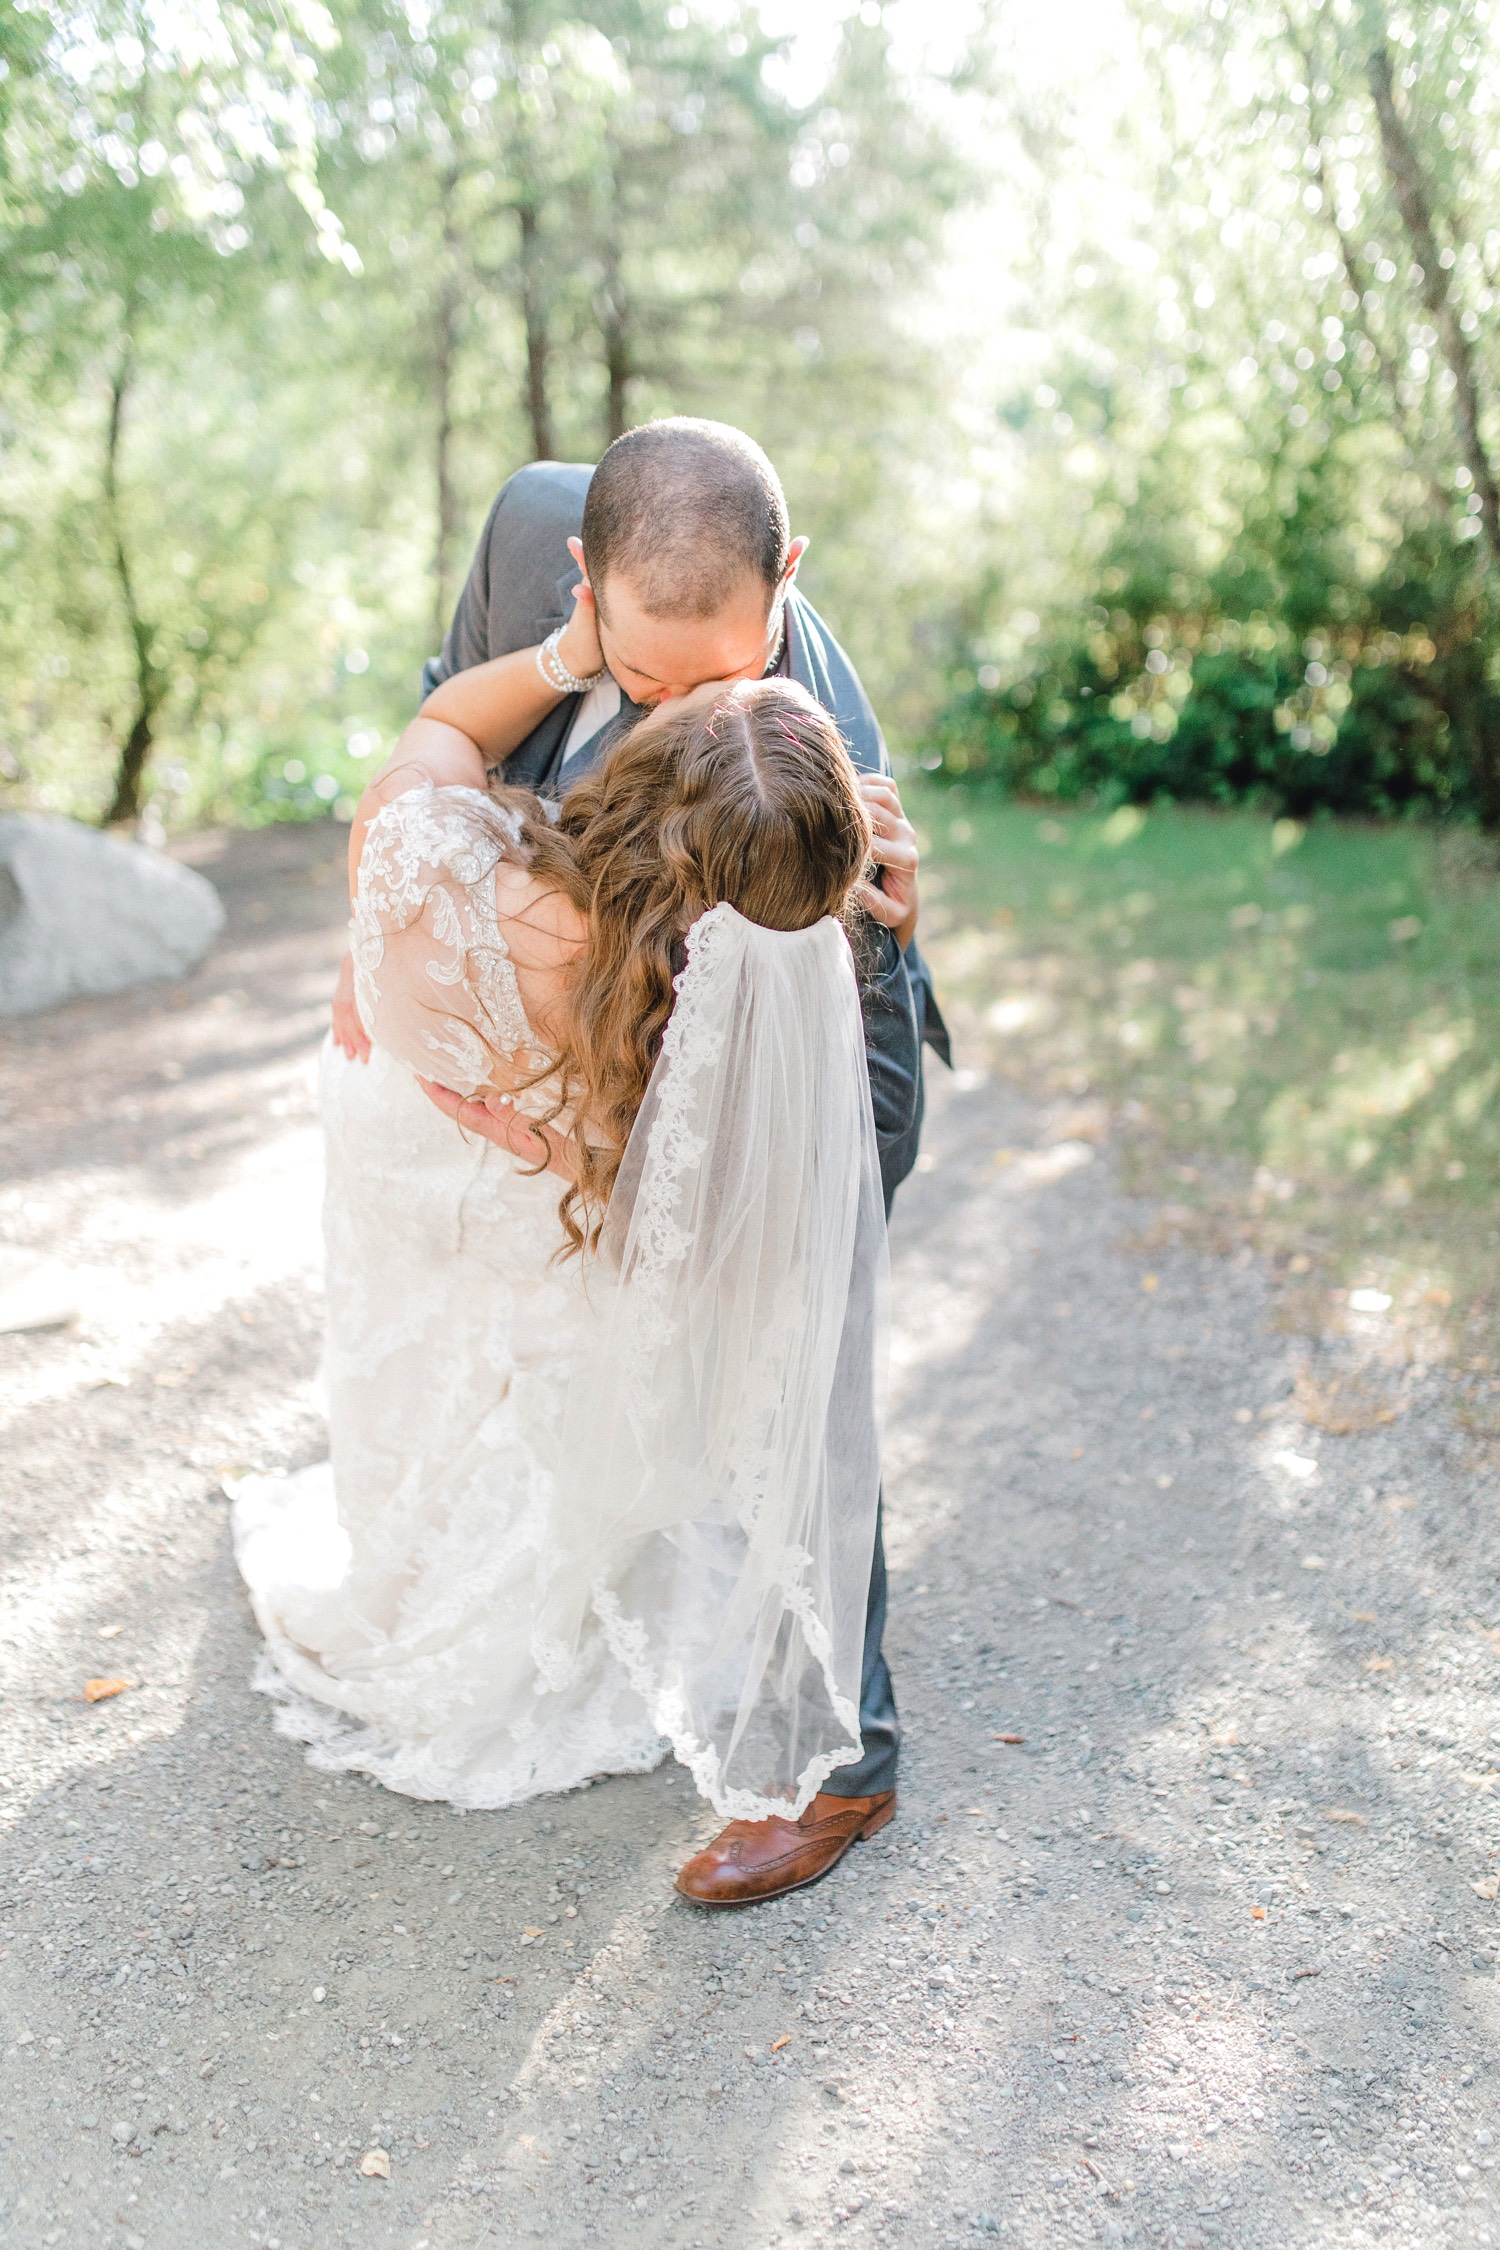 0000000000085_emmarosecompany_katiematt-4131_Photographer_PNW_House_Robinswood_Emma_Light_Company_Airy_Rose_and_Wedding_Seattle.jpg